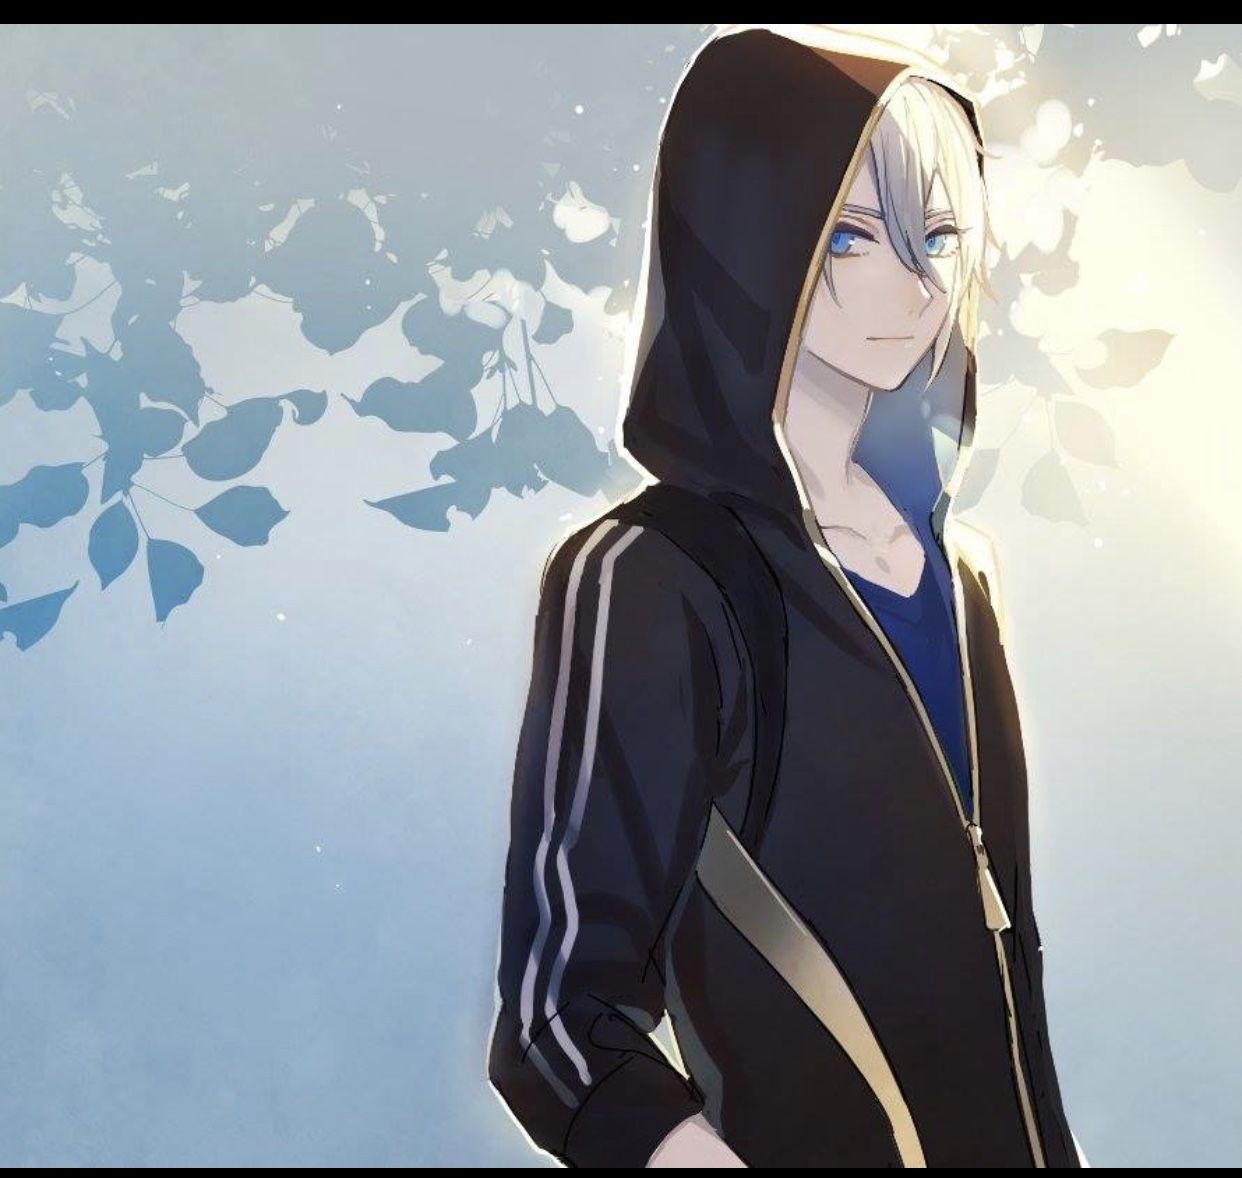 Chàng Trai Anime, Allen Walker, Pandora Hearts, Bản Vẽ, Kiến Thức,